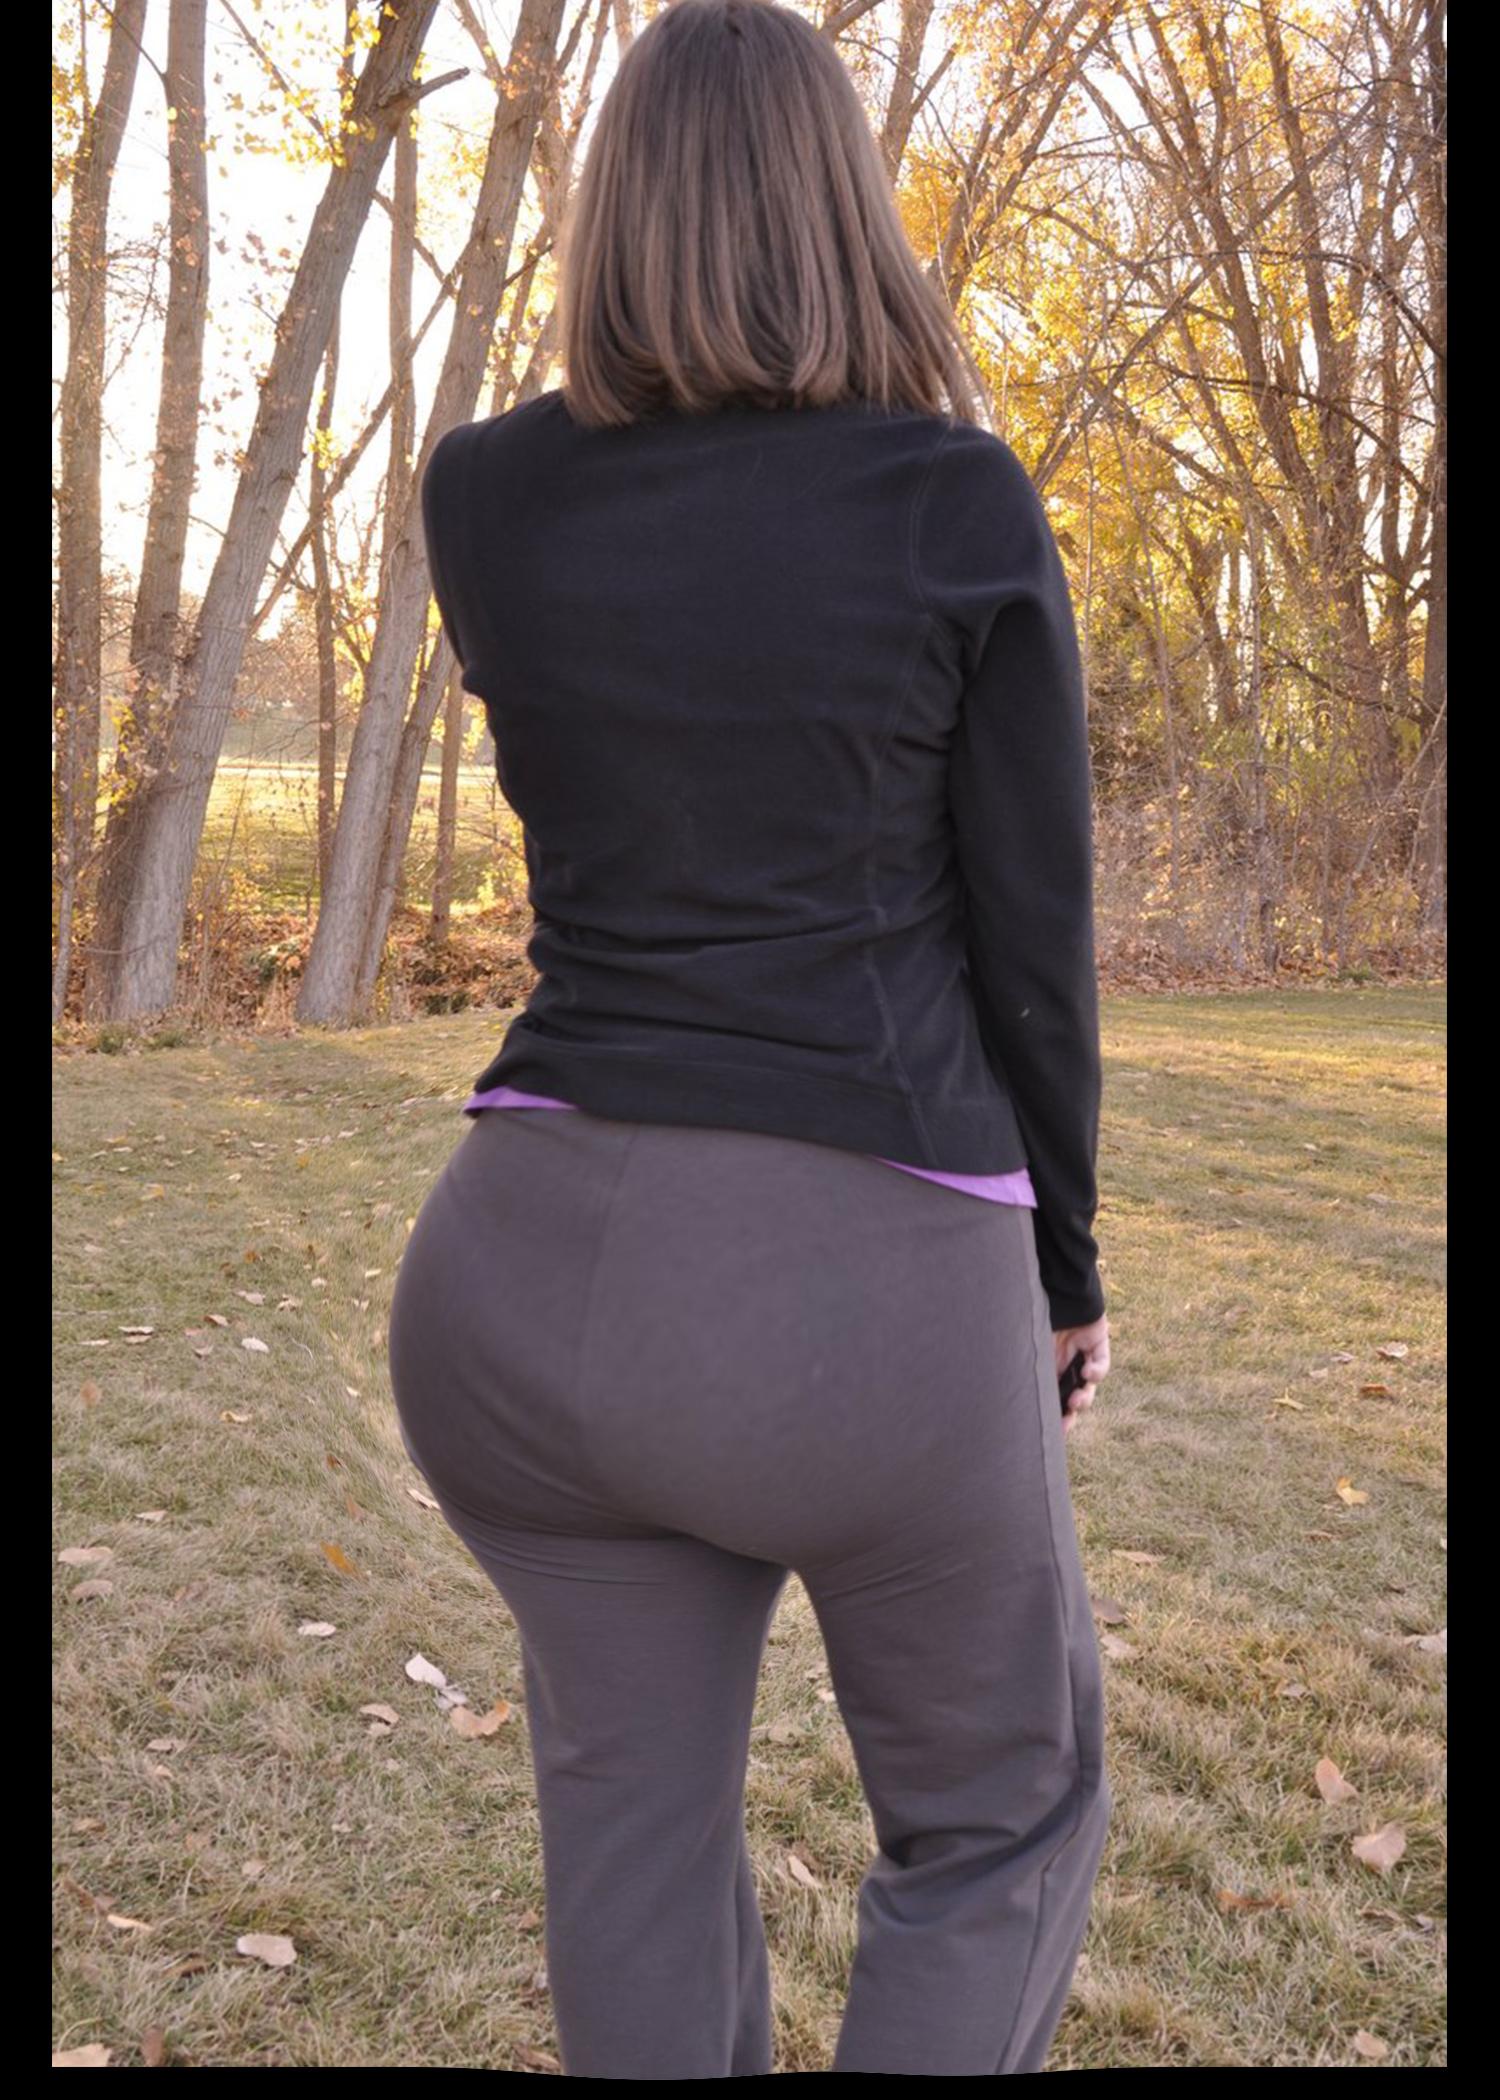 Hot-women-yoga-pants-7 by ericjason1976 on DeviantArt